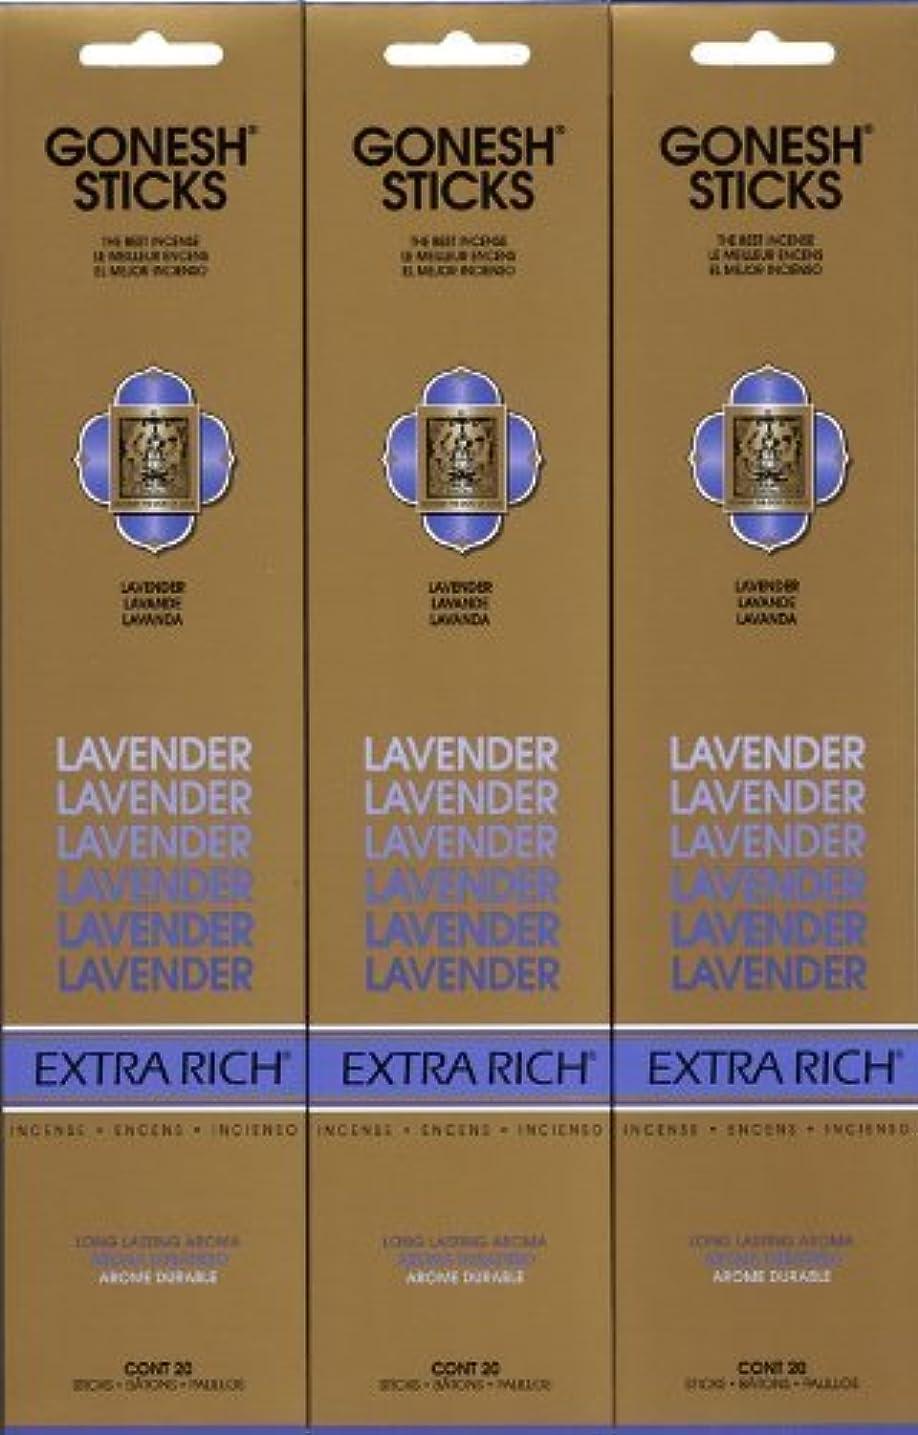 GONESH LAVENDER ラベンダー スティック 20本入り X 3パック (60本)